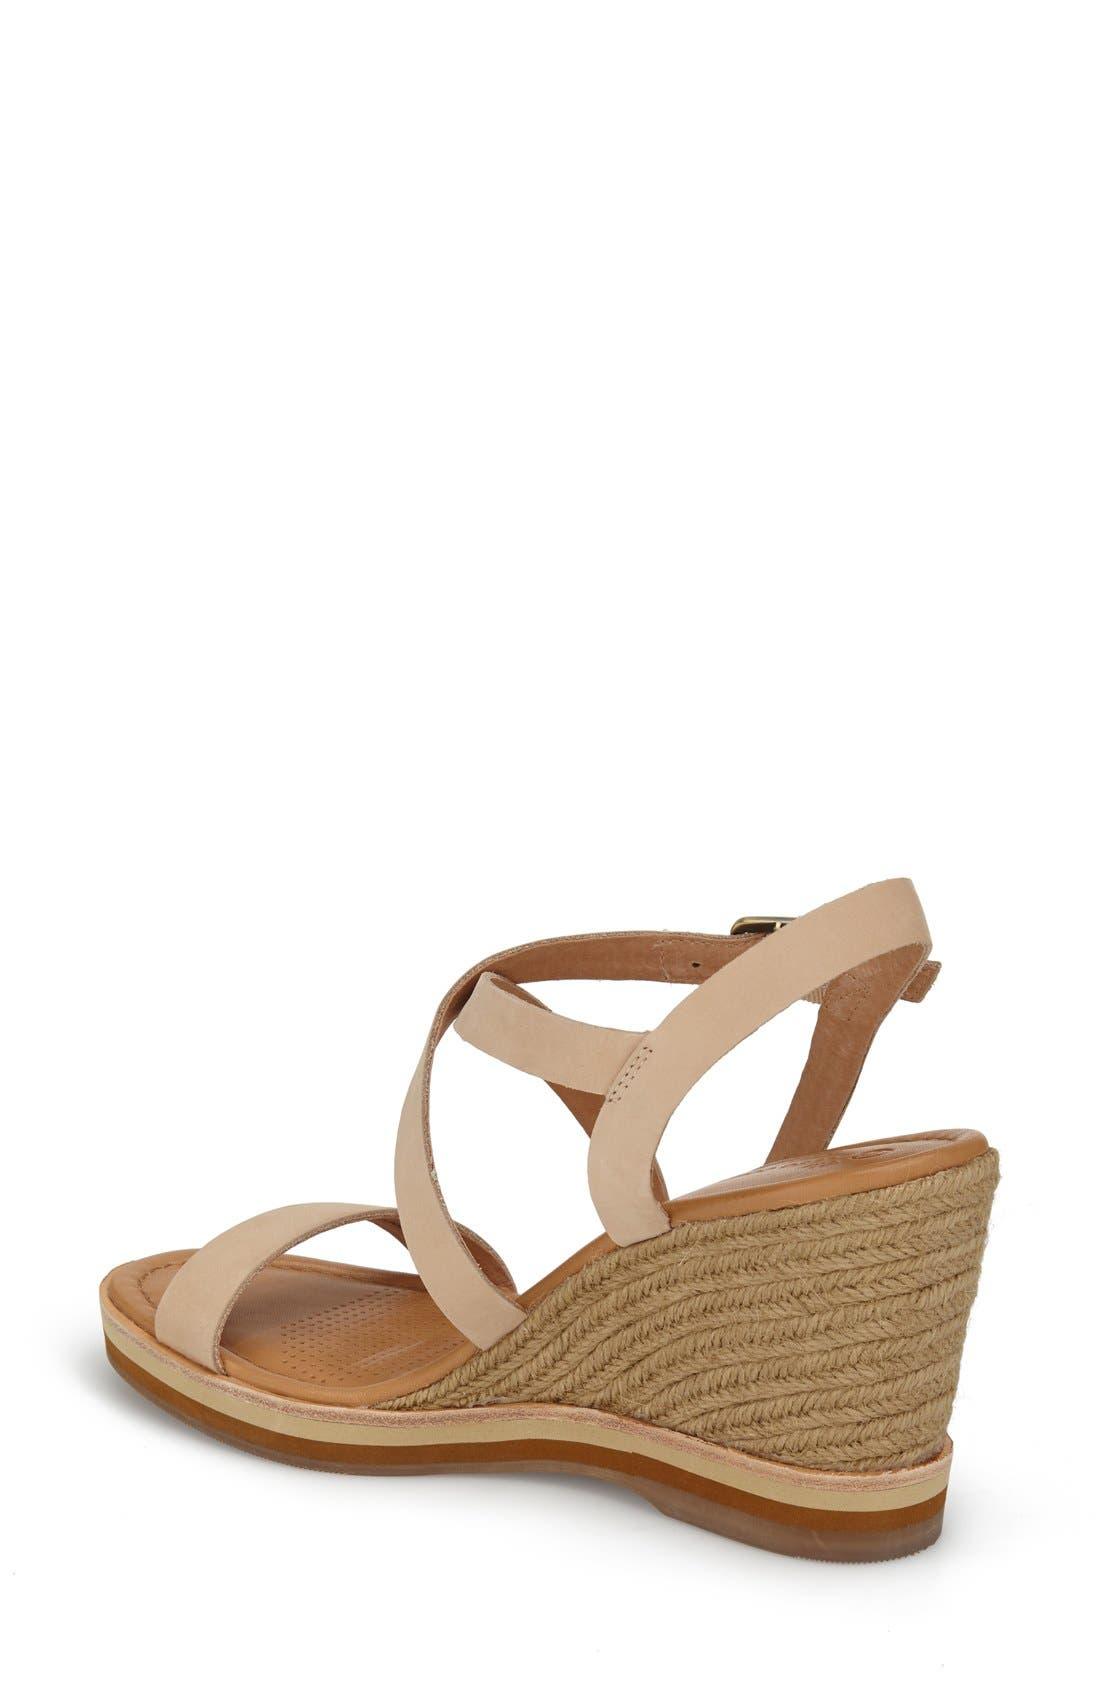 Alternate Image 2  - Corso Como 'Gladis' Espadrille Wedge Sandal (Women)